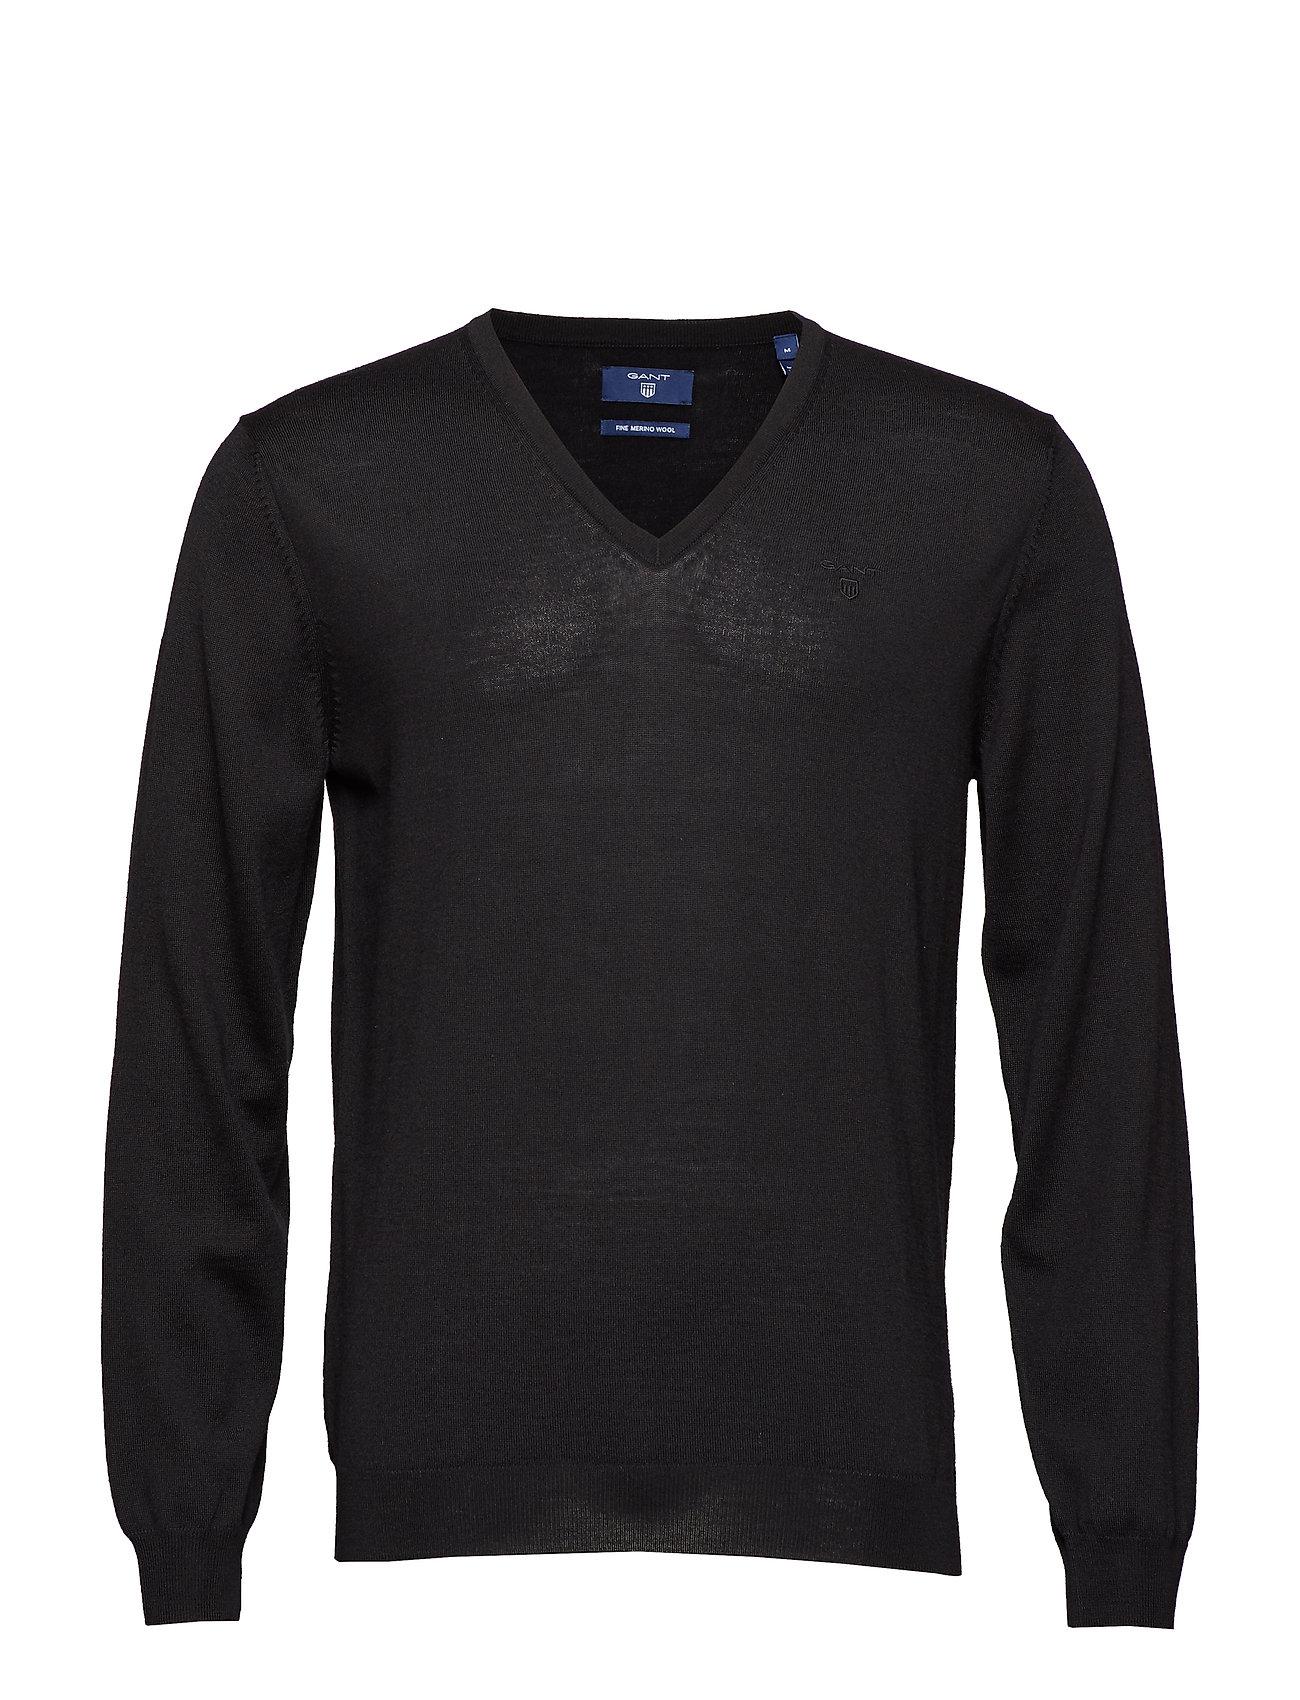 Gant FINE MERINO V-NECK - BLACK